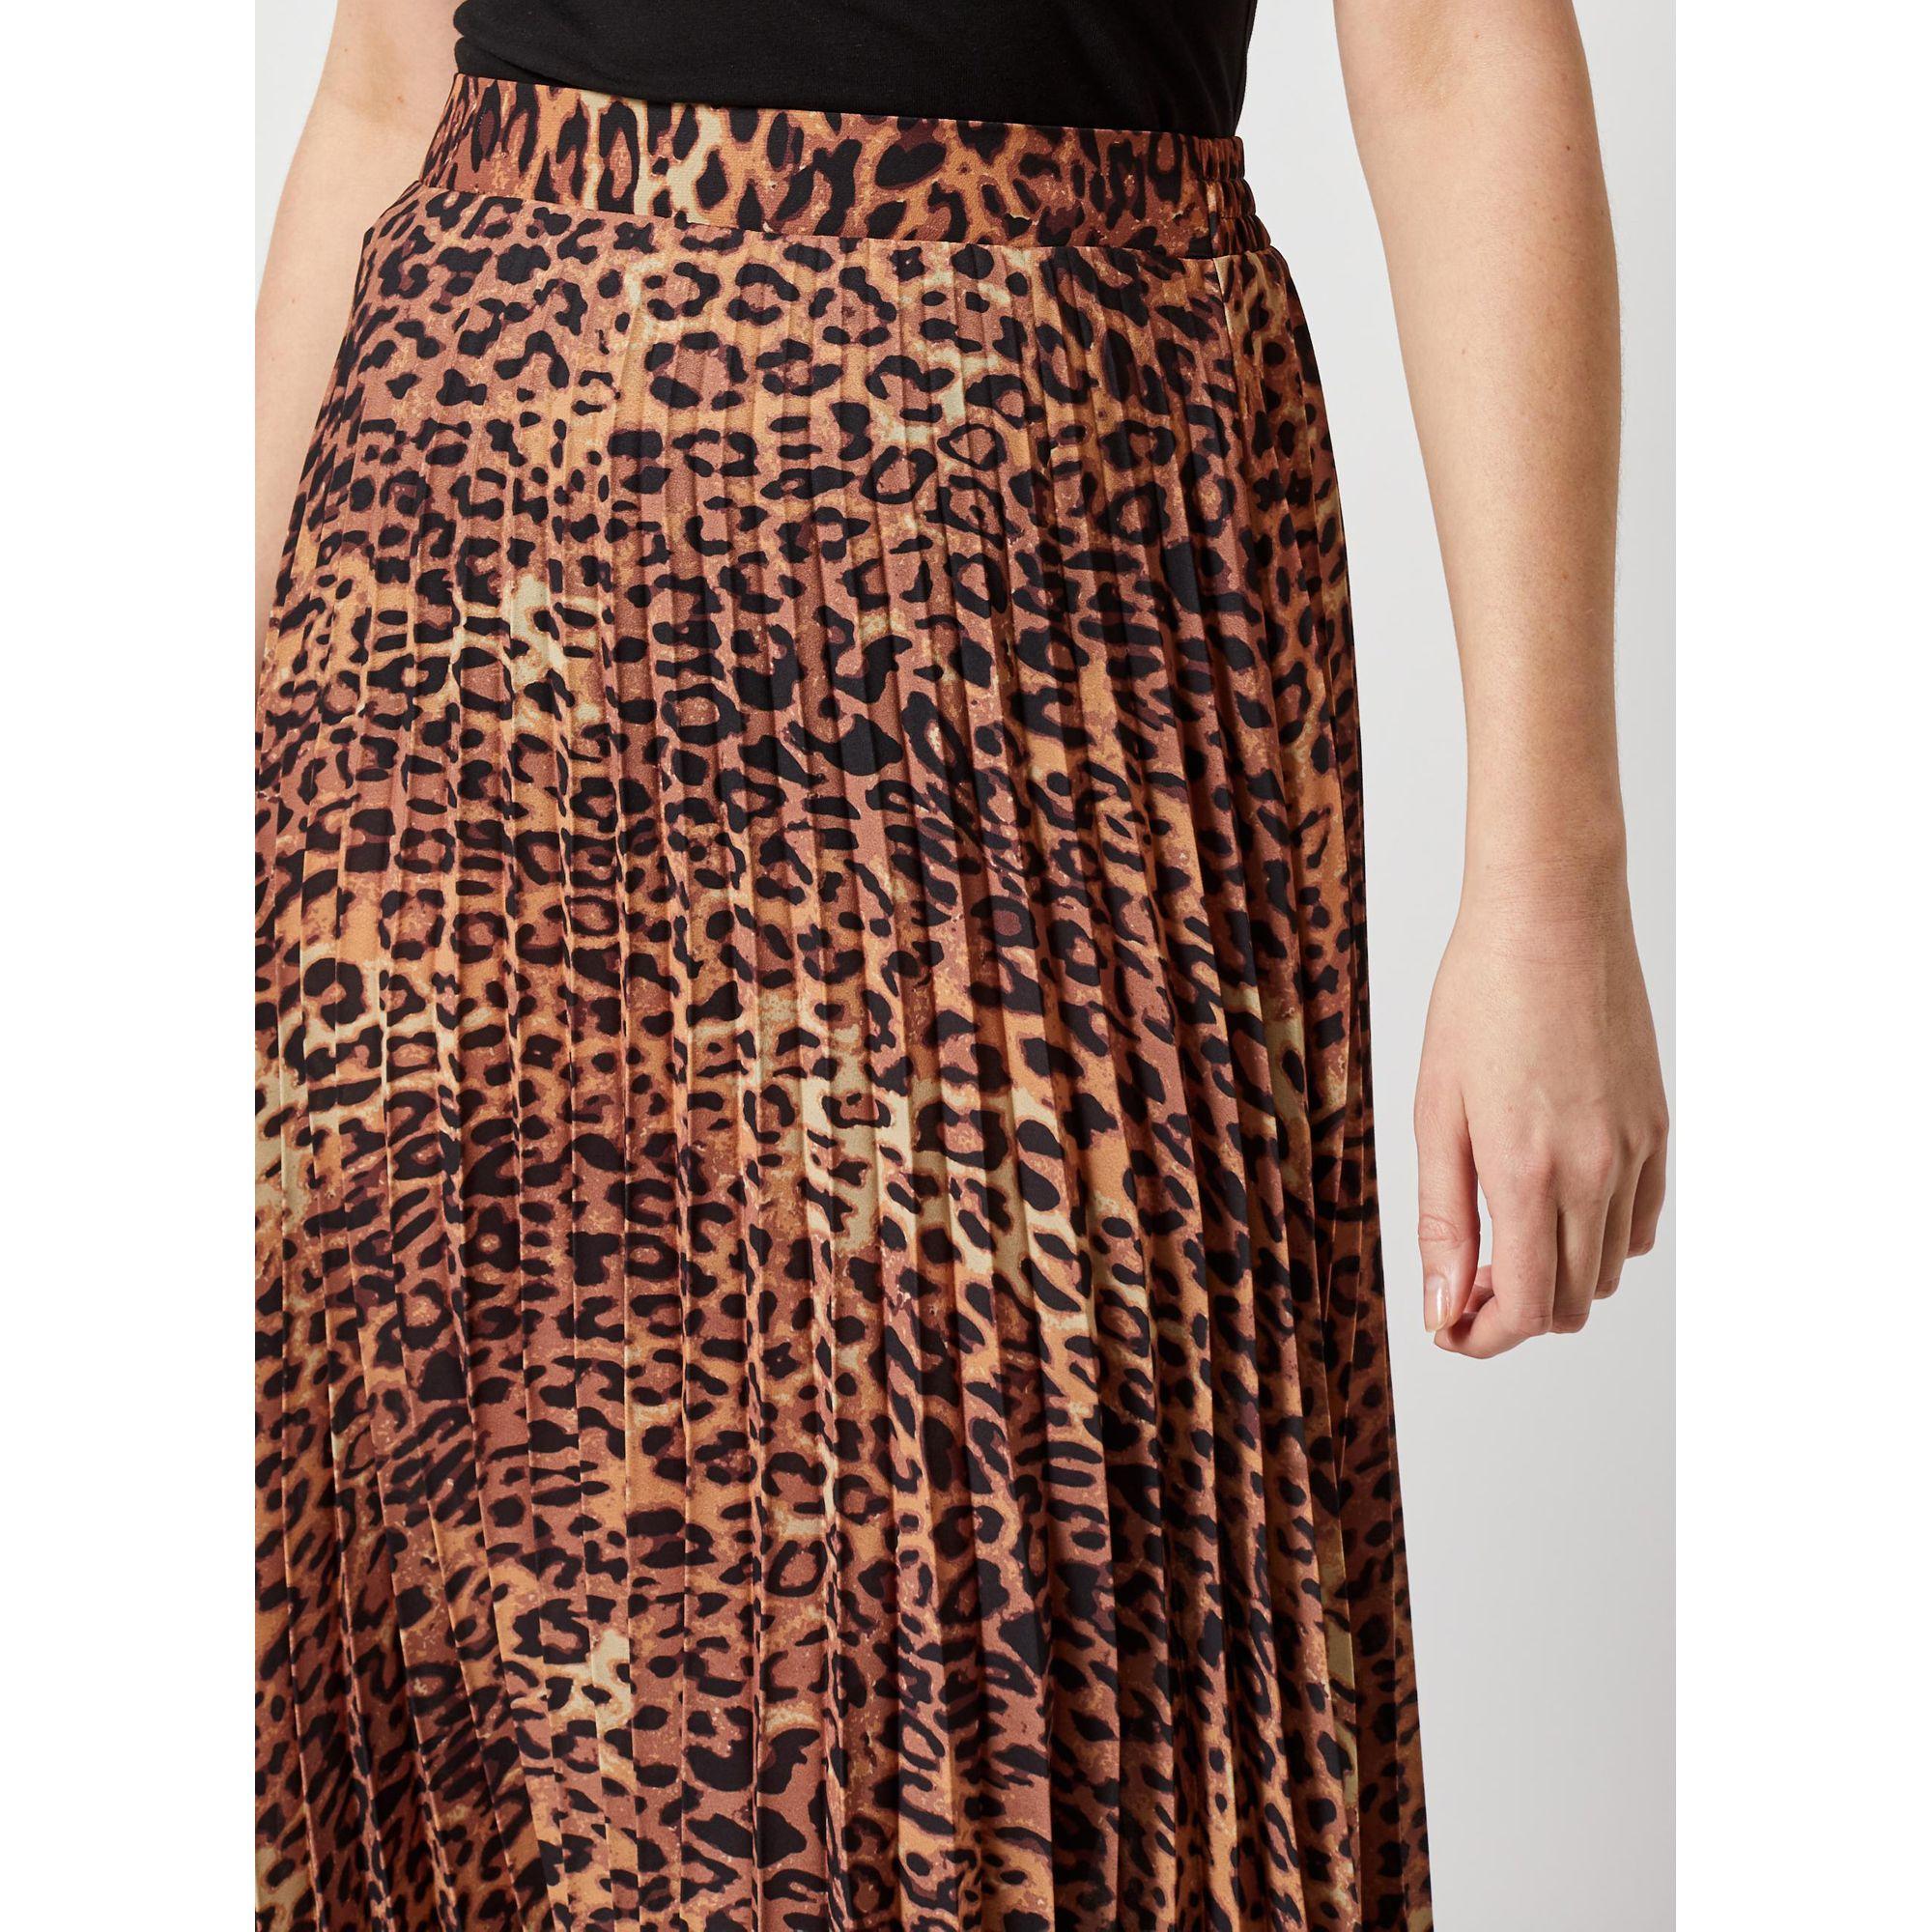 51936bd87e ... Dorothy Perkins - Brown Animal Print Pleated Midi Skirt - Lyst. Visit  Debenhams. Tap to visit site